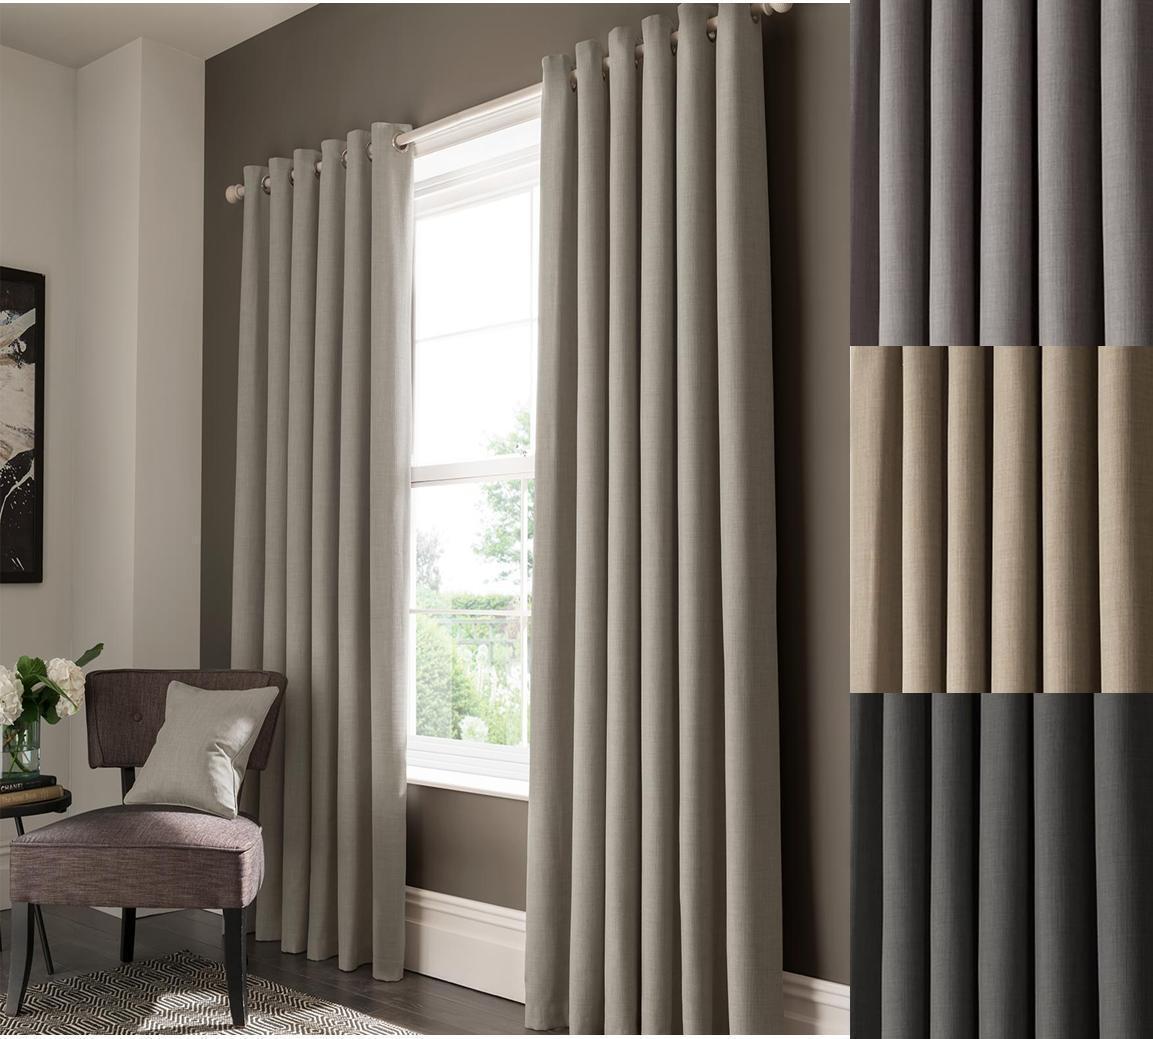 One One One Pair Of STUDIO G Lined Texturot Semi-Plain Elba 3  Pencil Pleat Curtains ce8b20